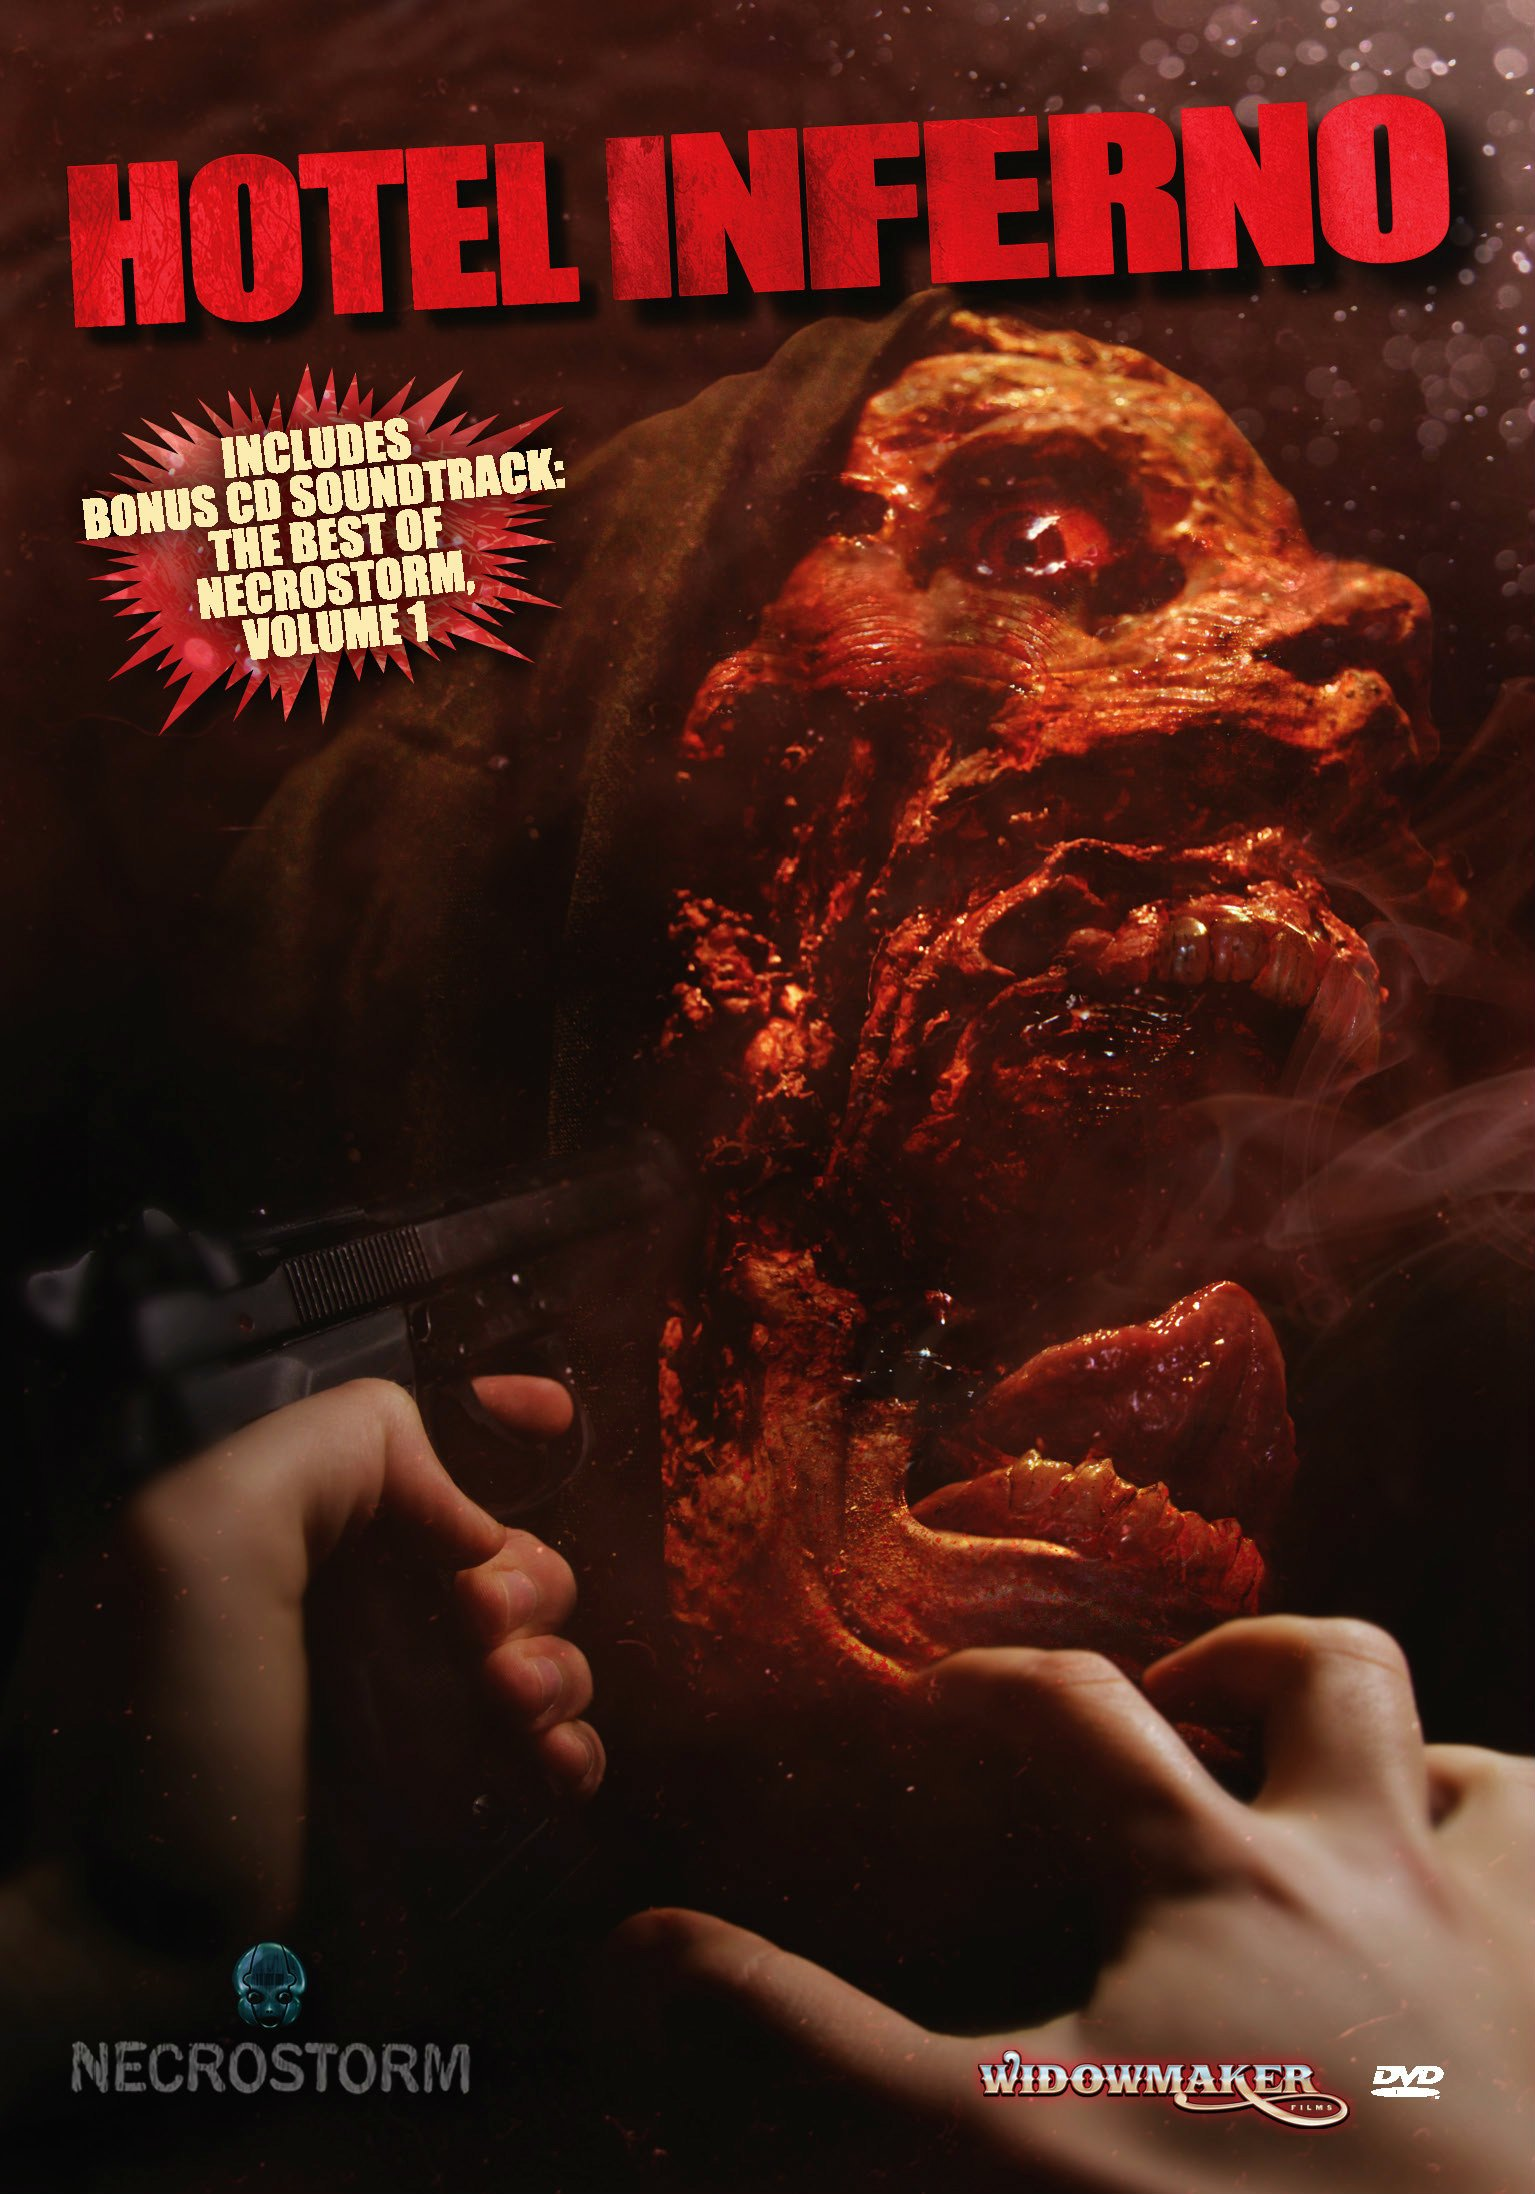 DVD : Hotel Inferno (Bonus CD, 2 Disc)